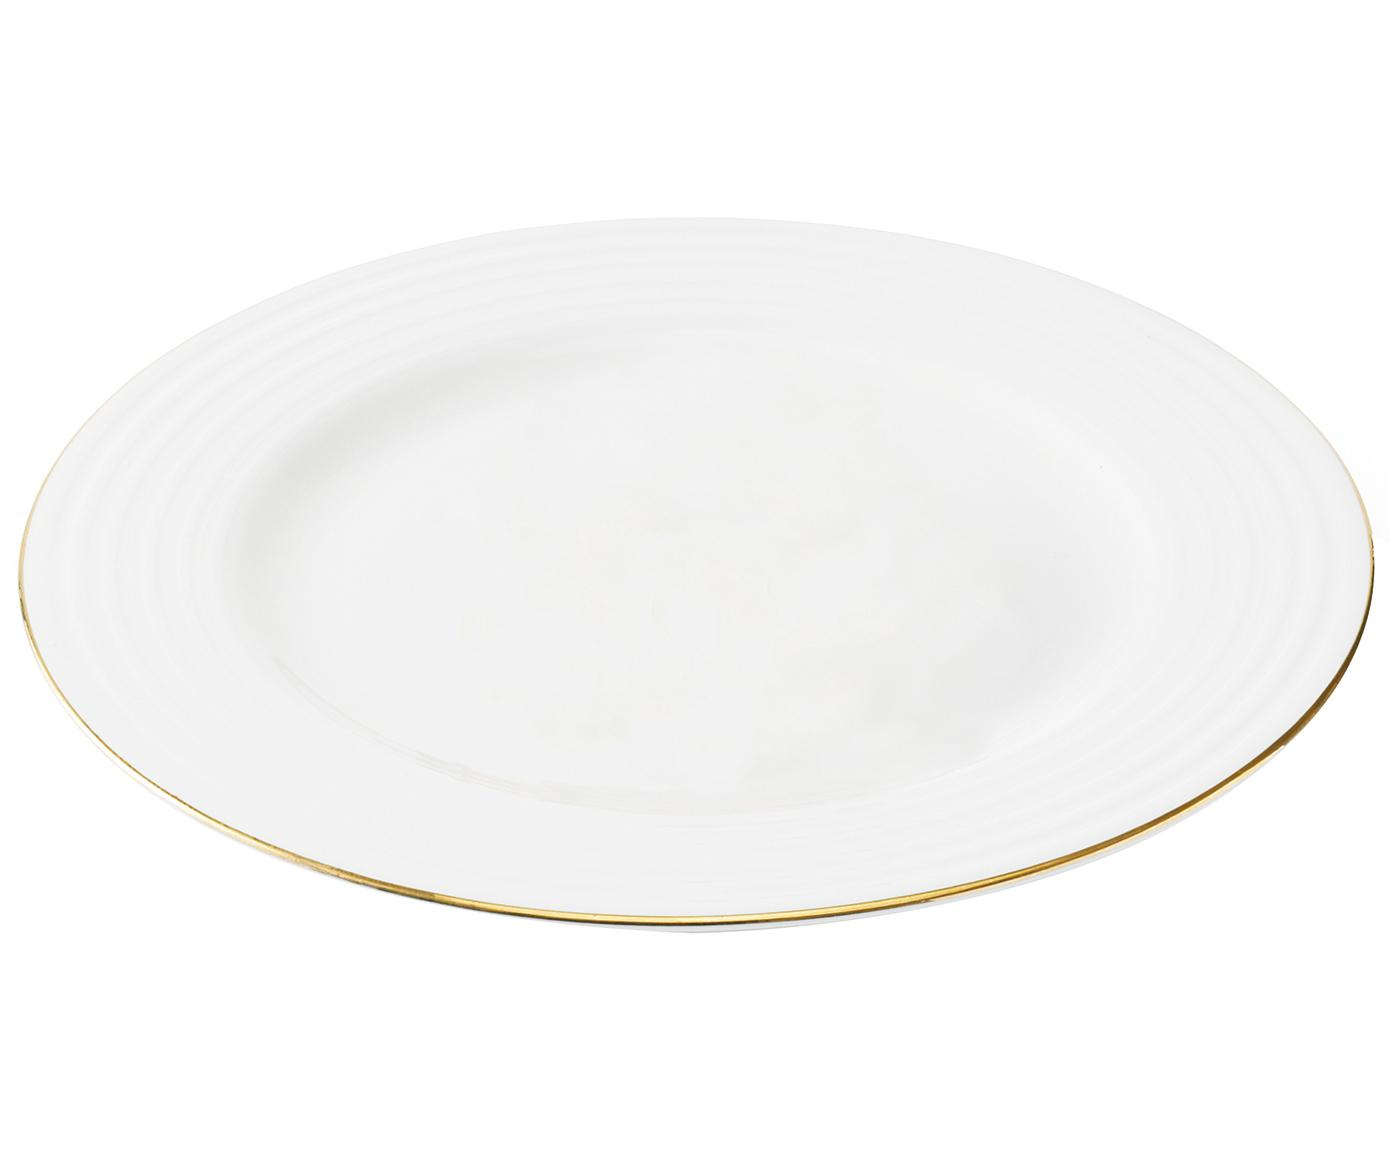 Ontbijtbord Cobald, 4 stuks, Porselein, Wit, goudkleurig, Ø 23 cm